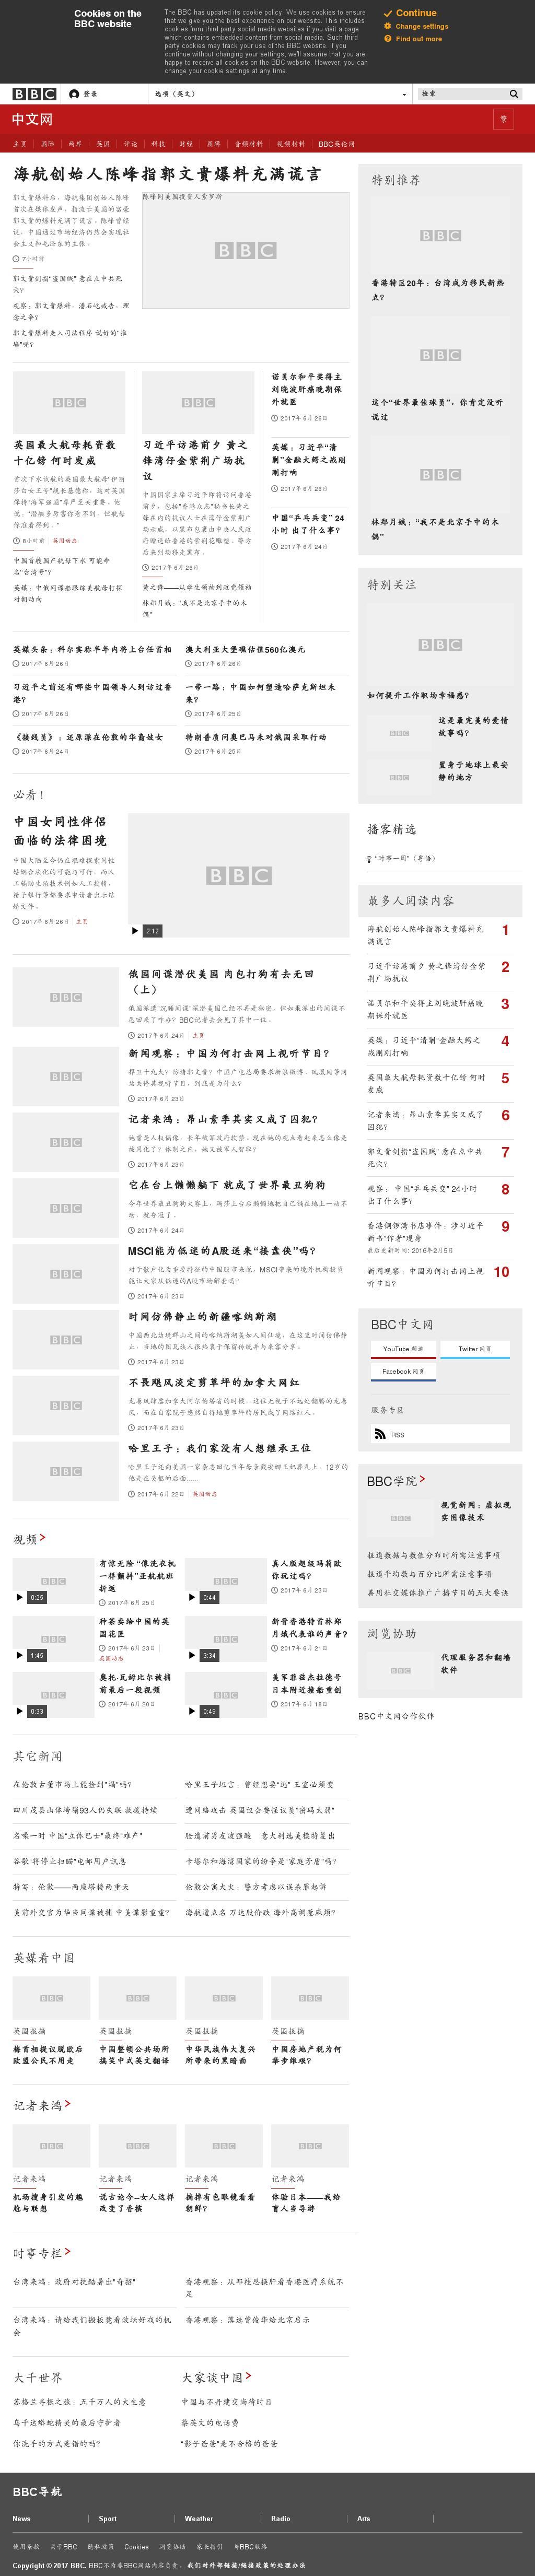 BBC (Chinese) at Tuesday June 27, 2017, 3:01 a.m. UTC